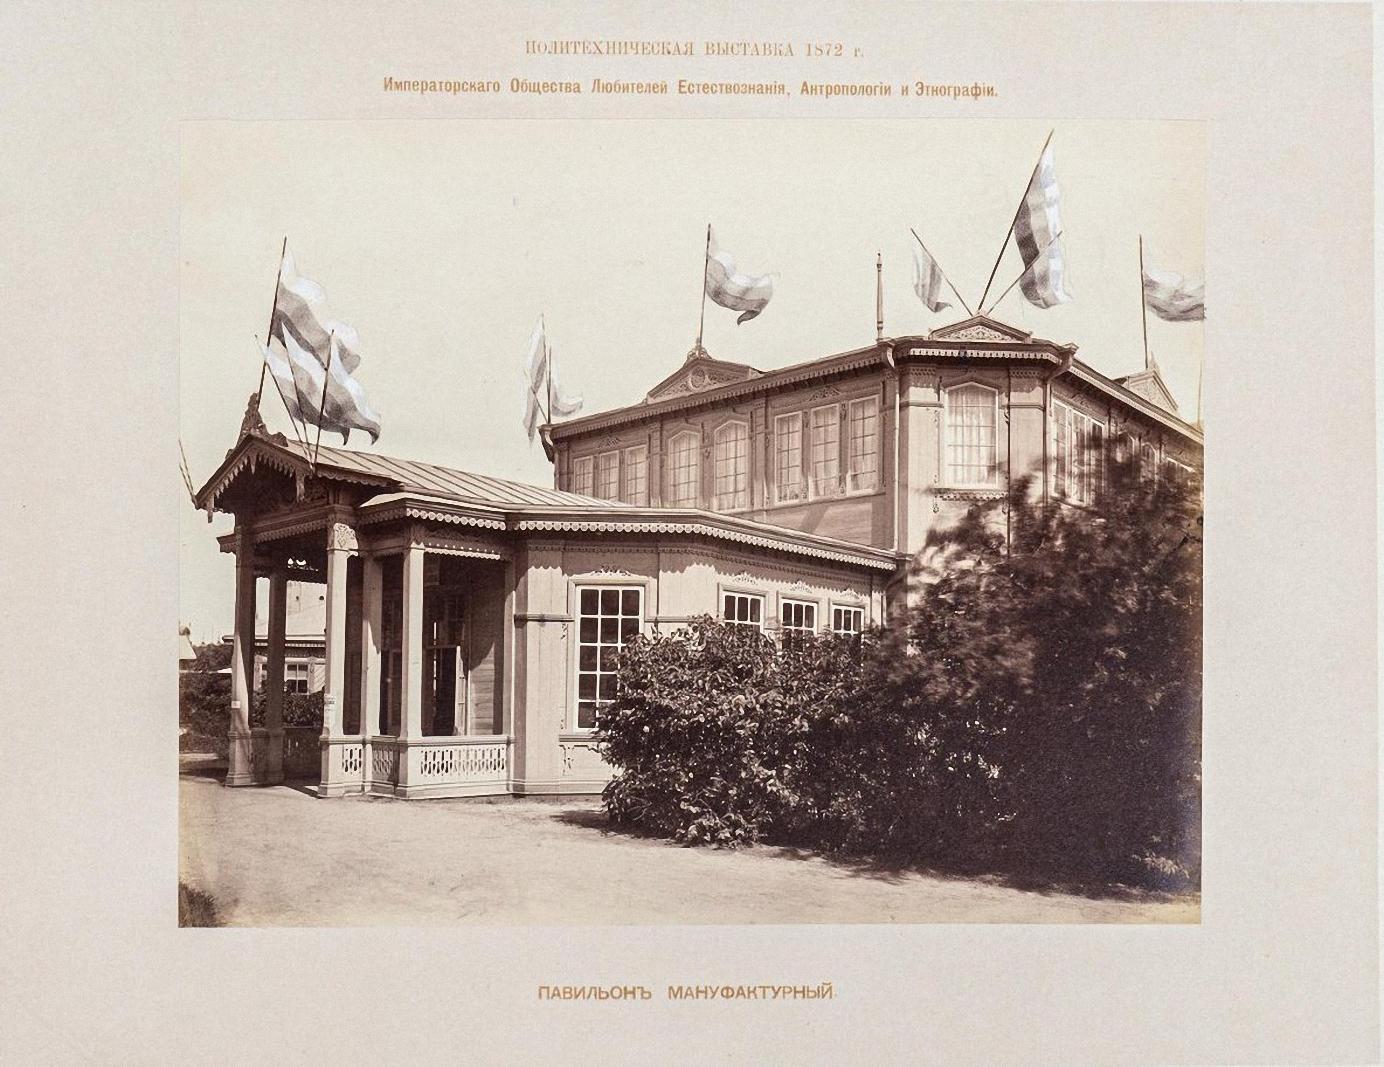 Александровский сад. Павильон мануфактурный